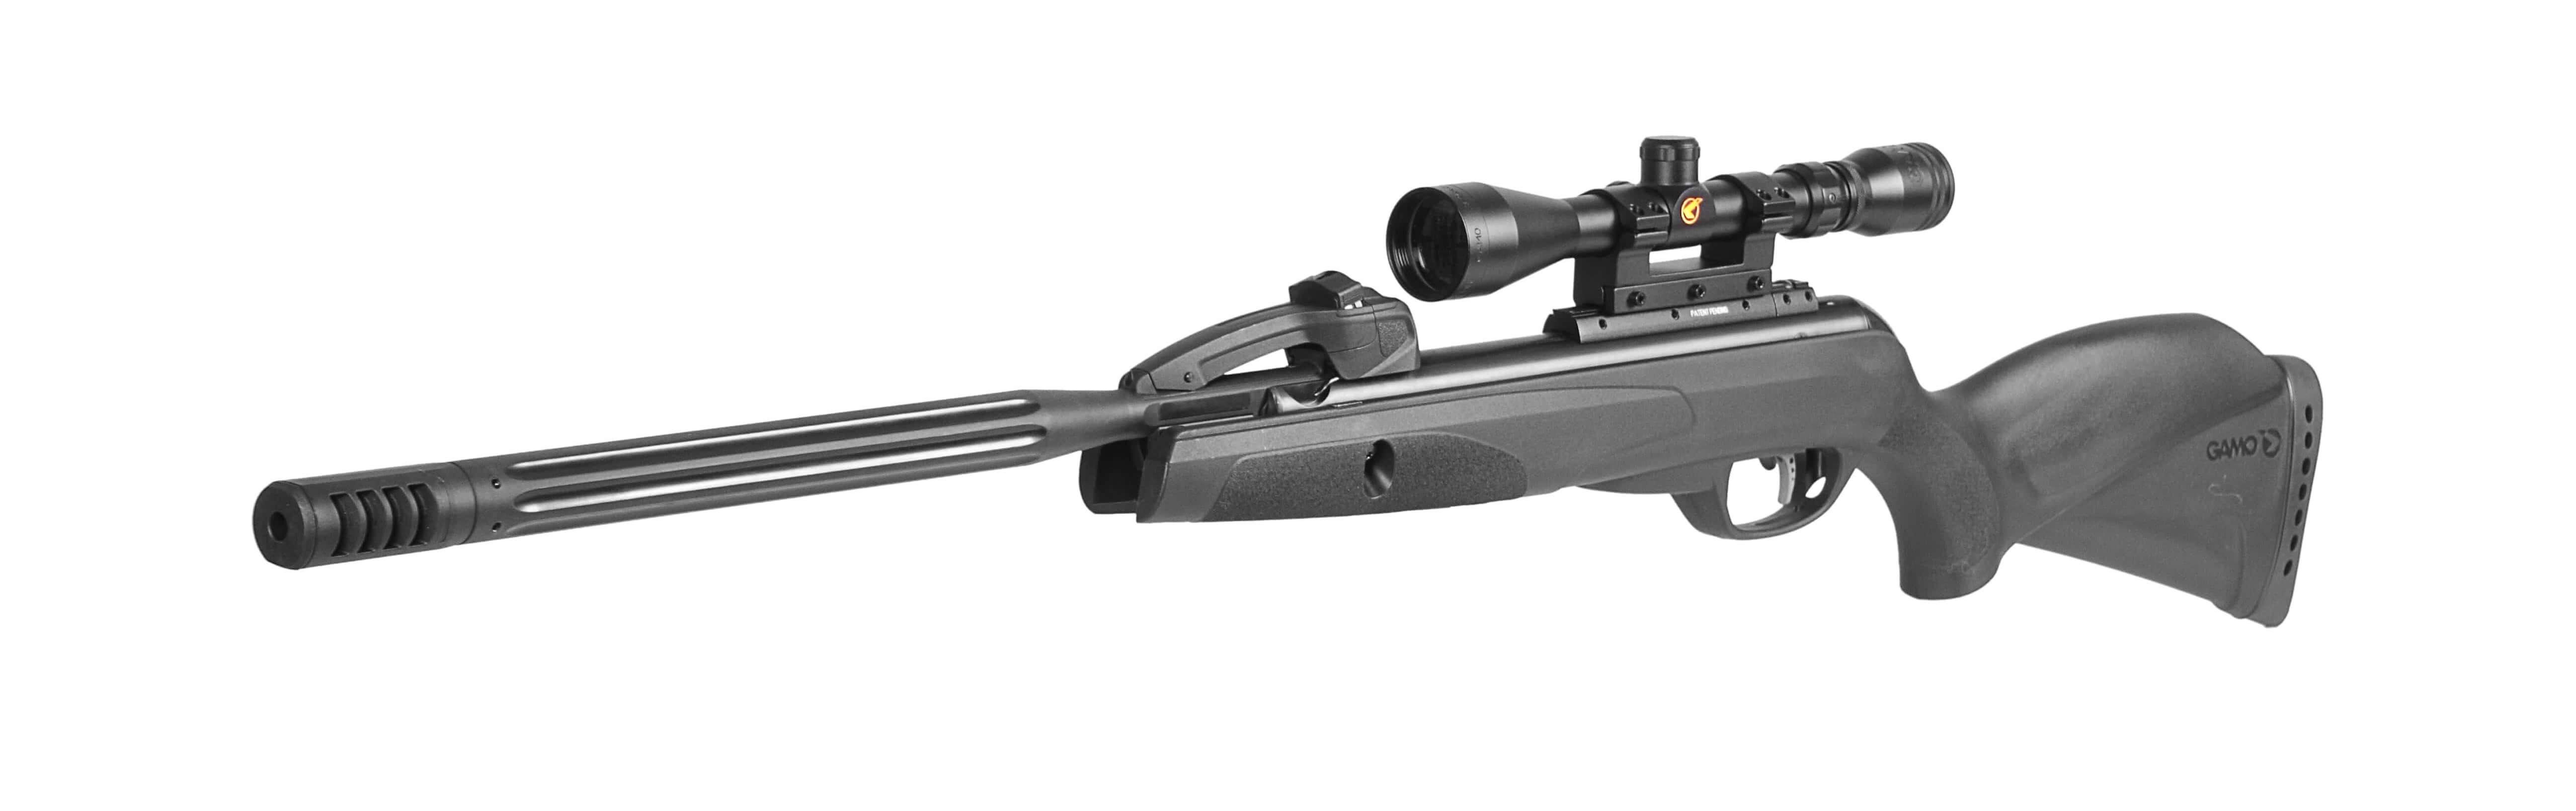 Gamo Black 10 Maxxim luftgevær